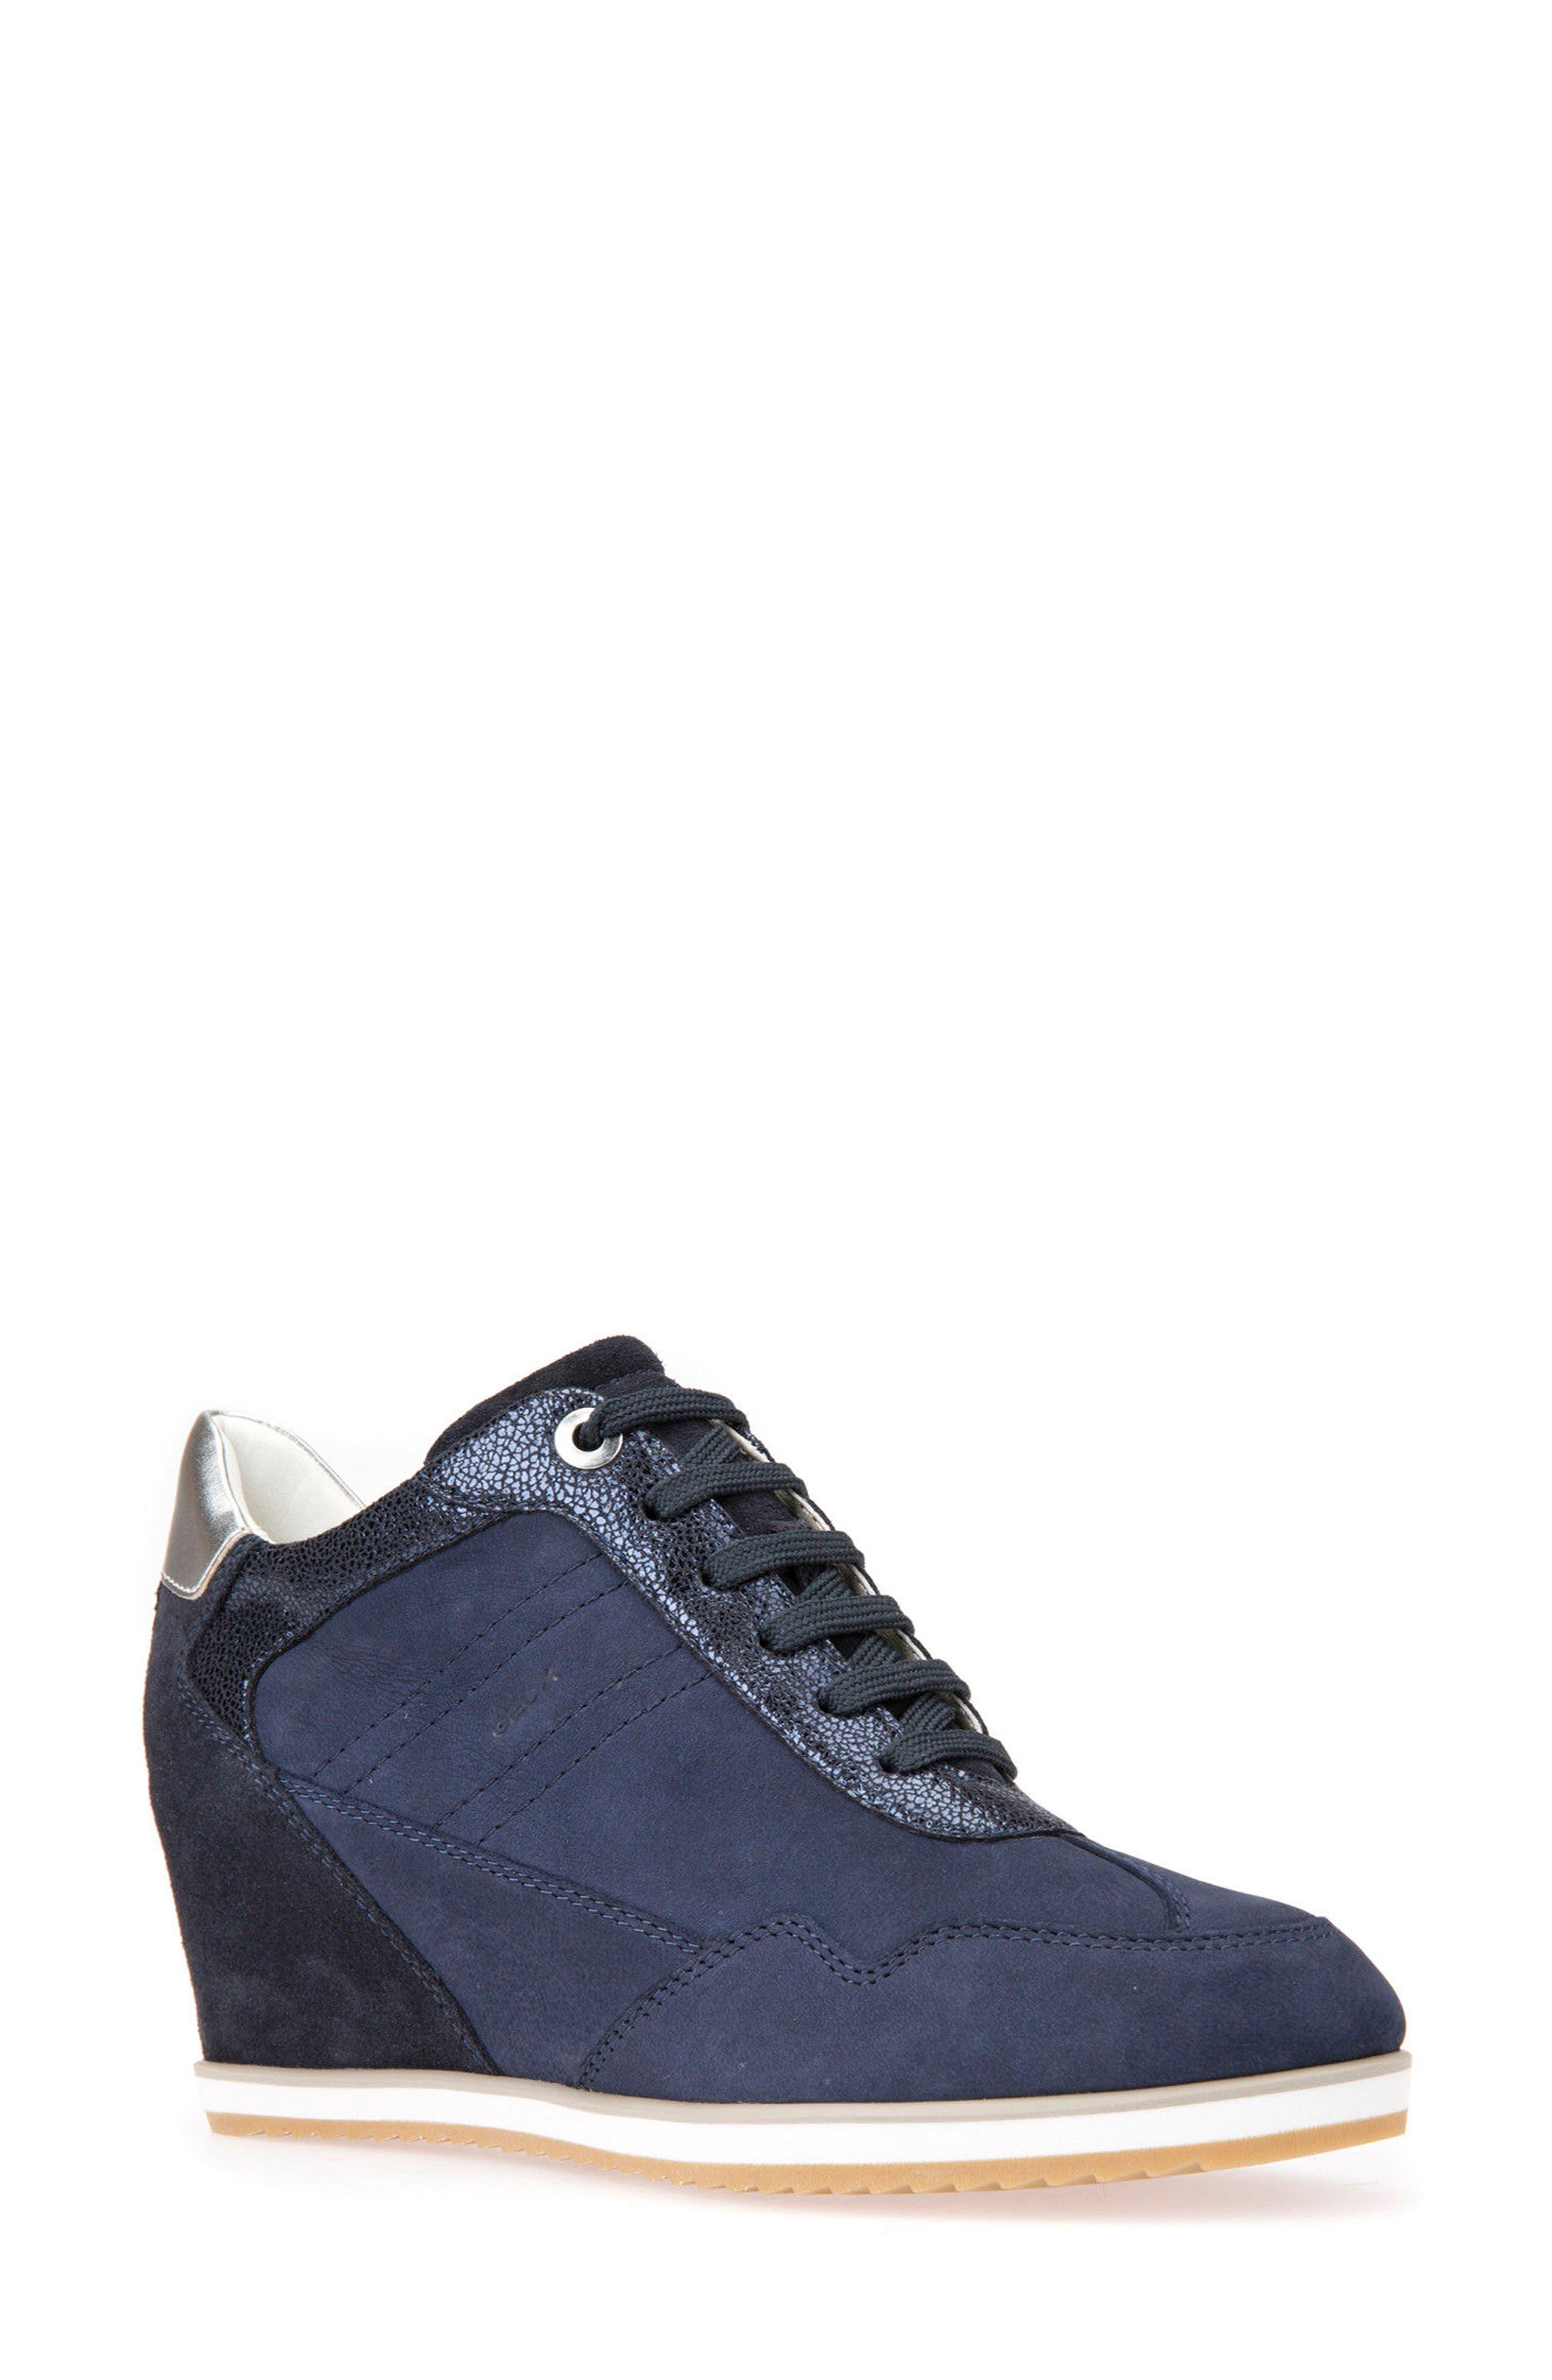 Main Image - Geox Illusion 34 Wedge Sneaker (Women)